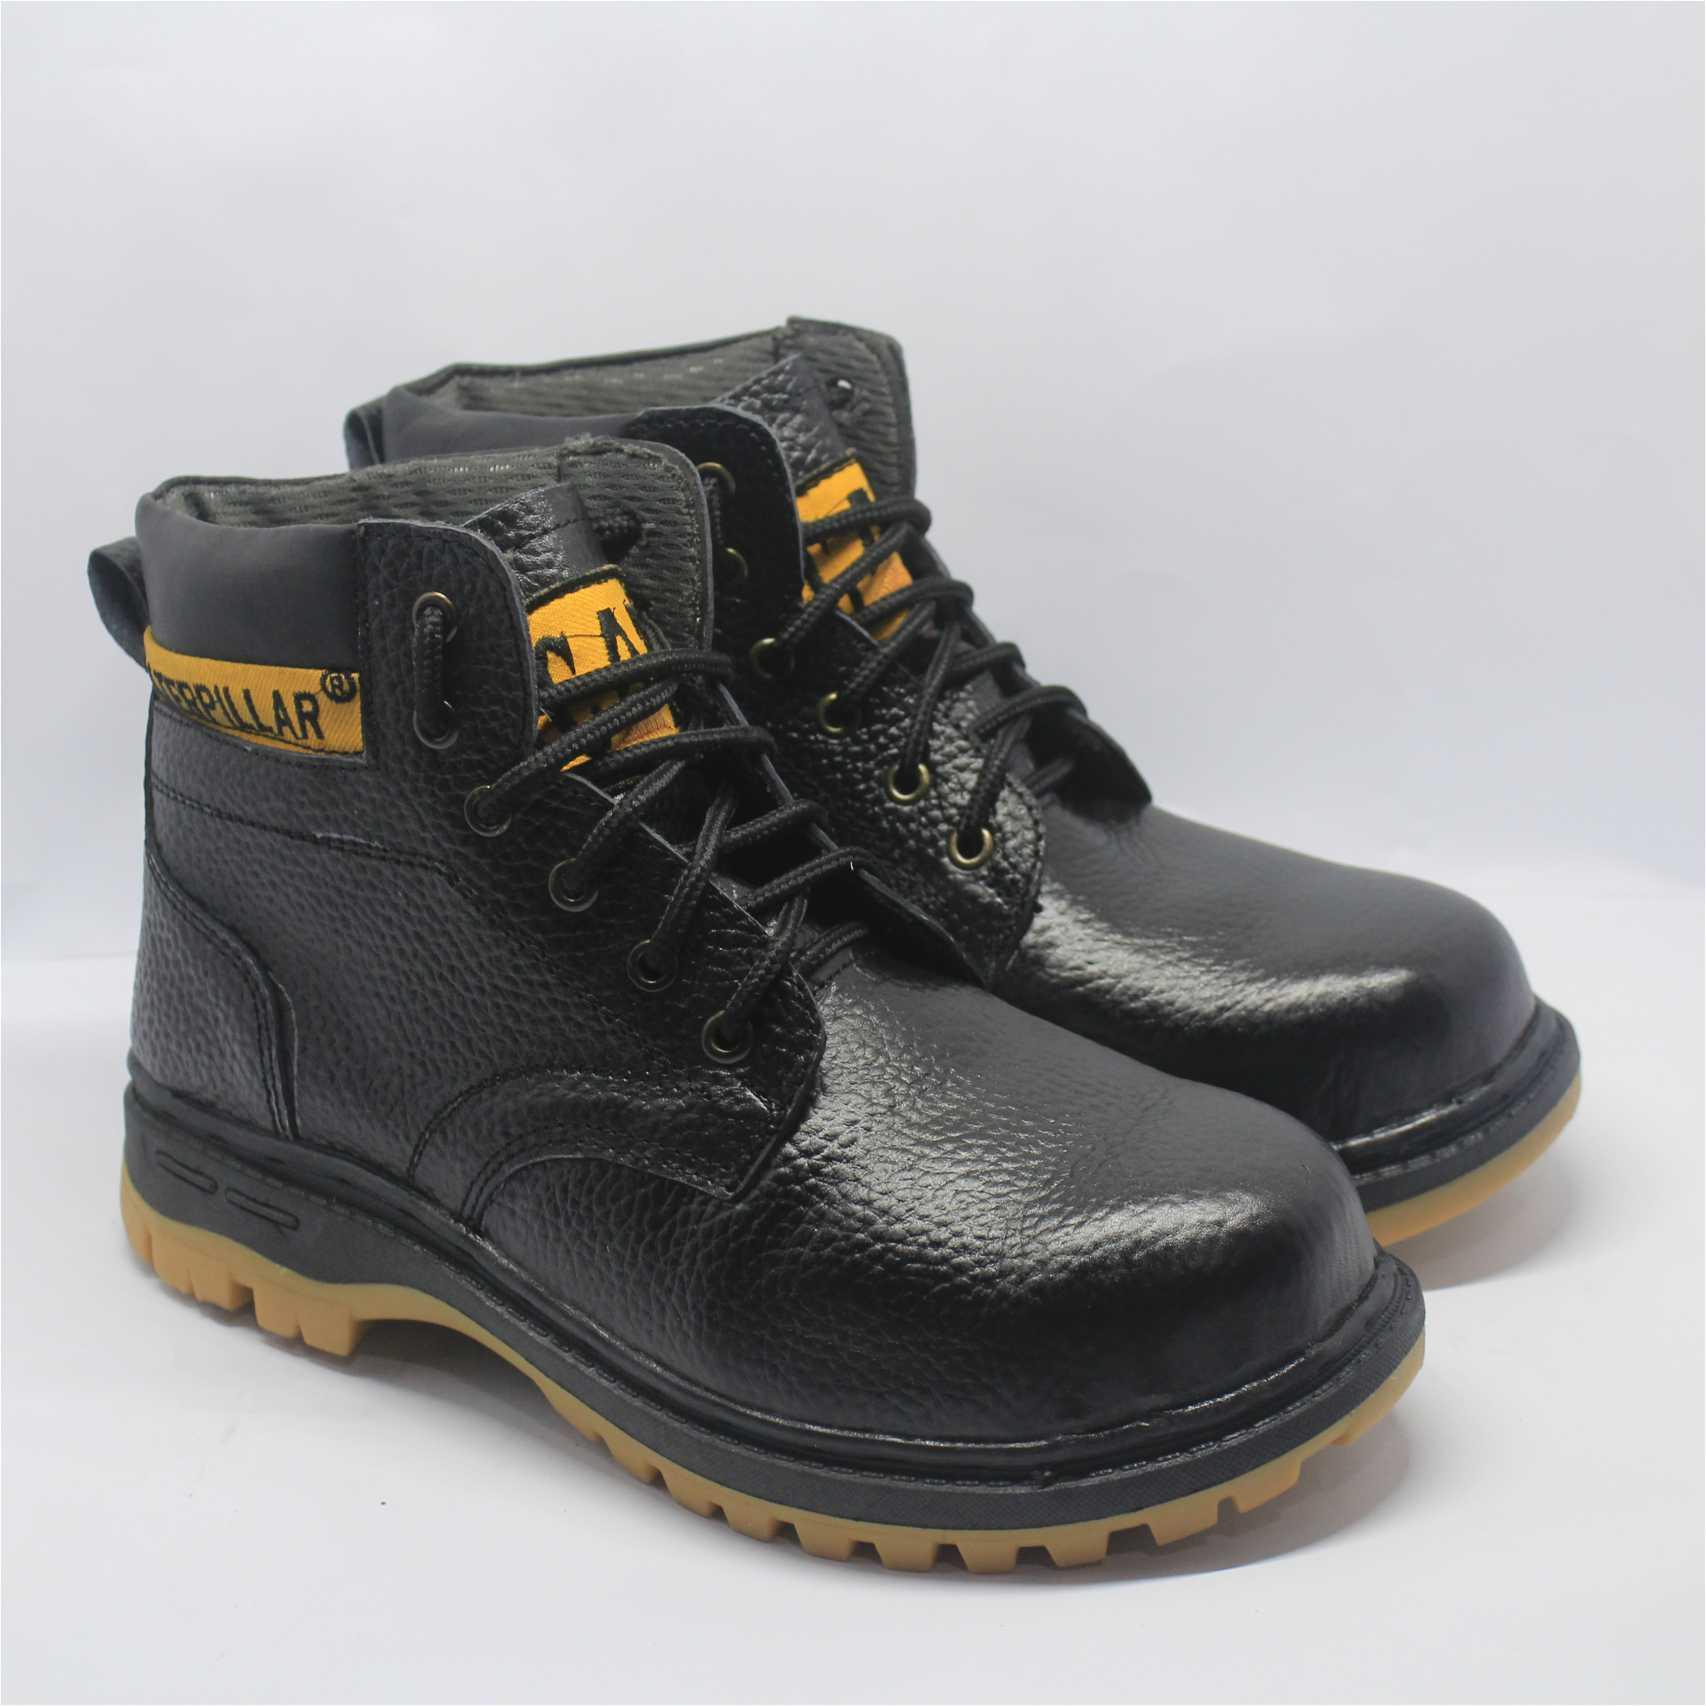 Caterpillar - Sepatu Safety Boots Pria 100% Kulit Asli Warna Hitam   Coklat  Ada Plat 6ace33f954